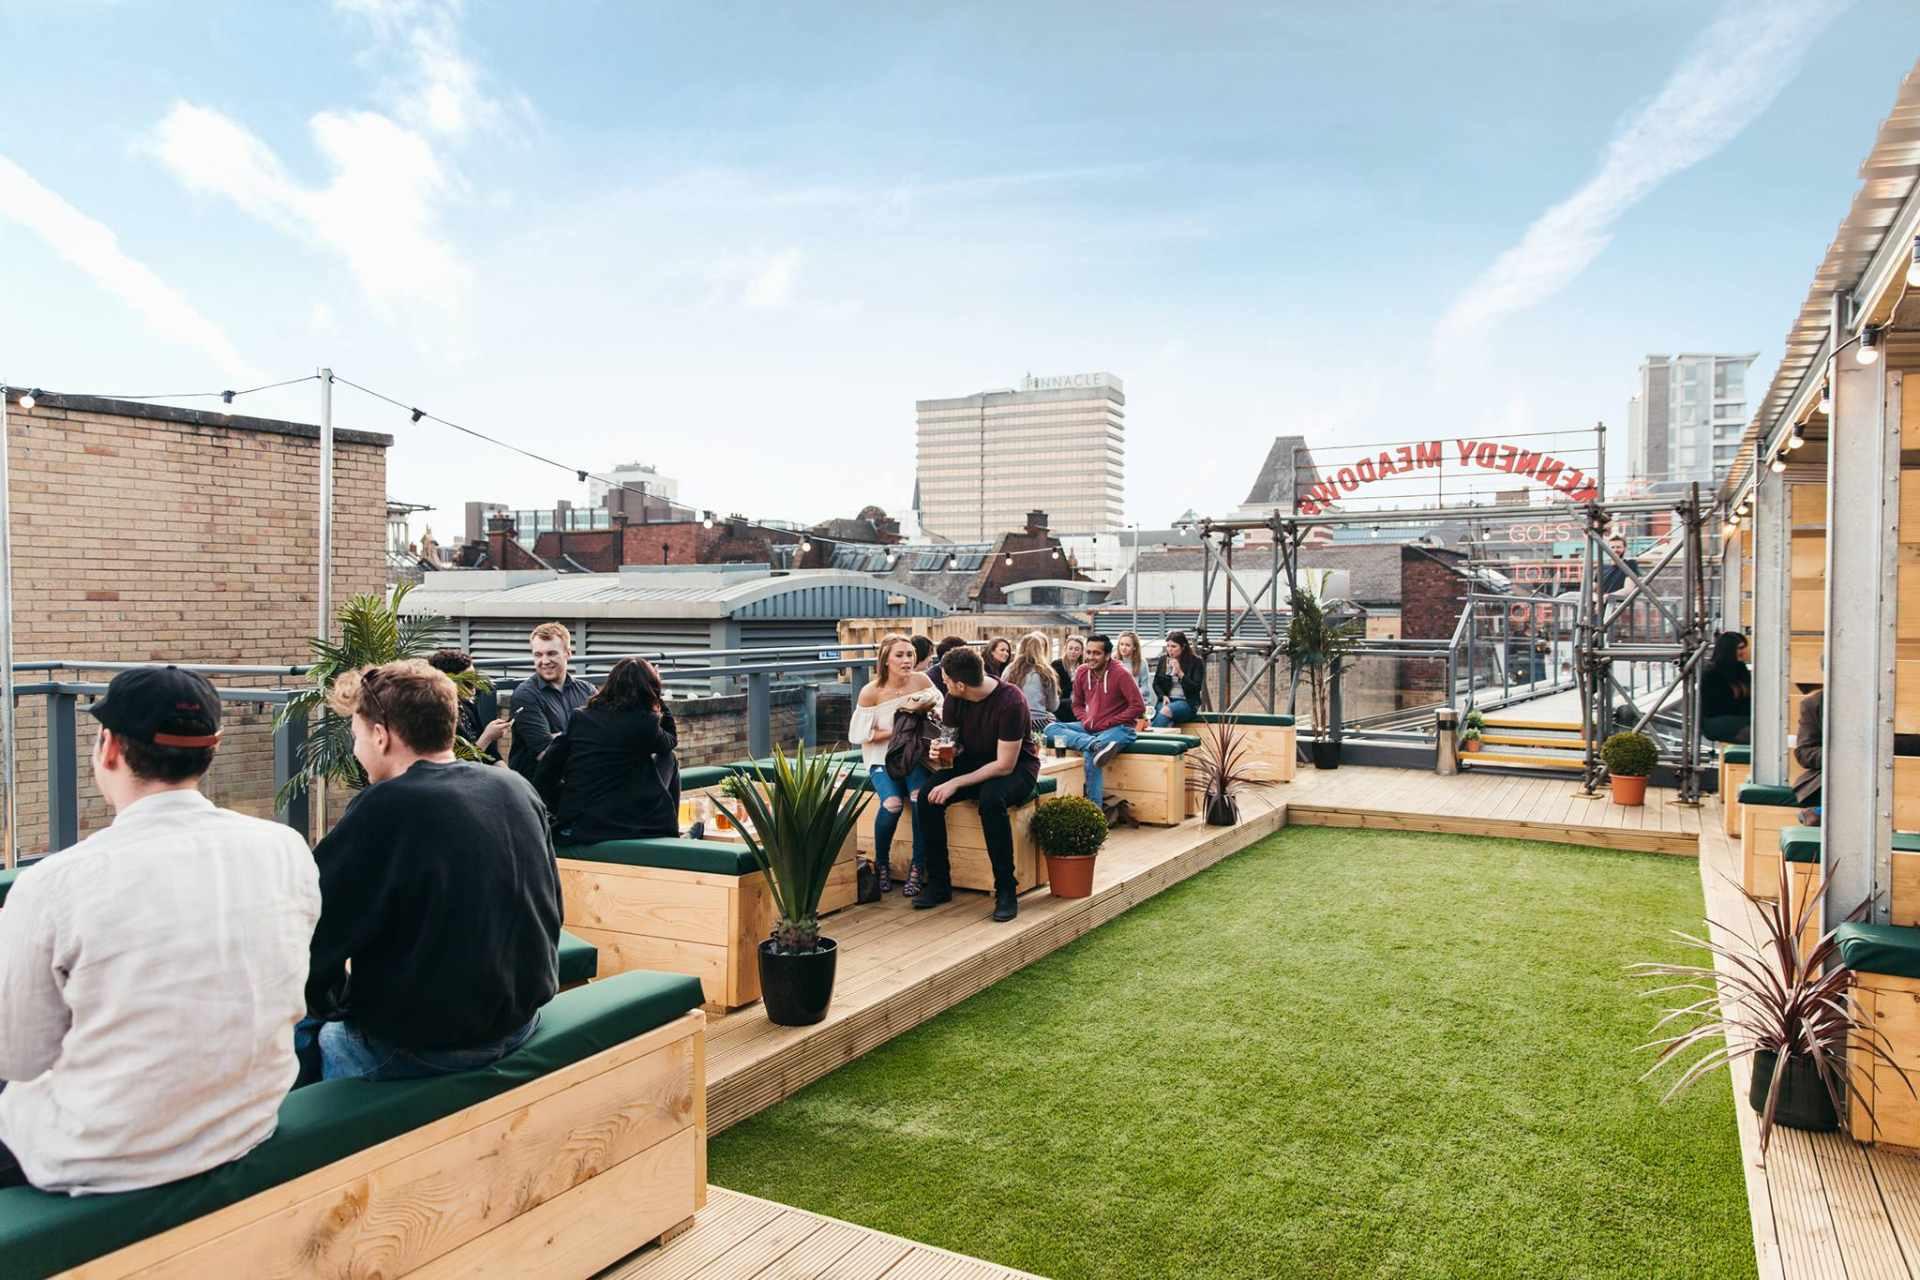 rooftop-bar-at-headrow-house-weekend-in-leeds